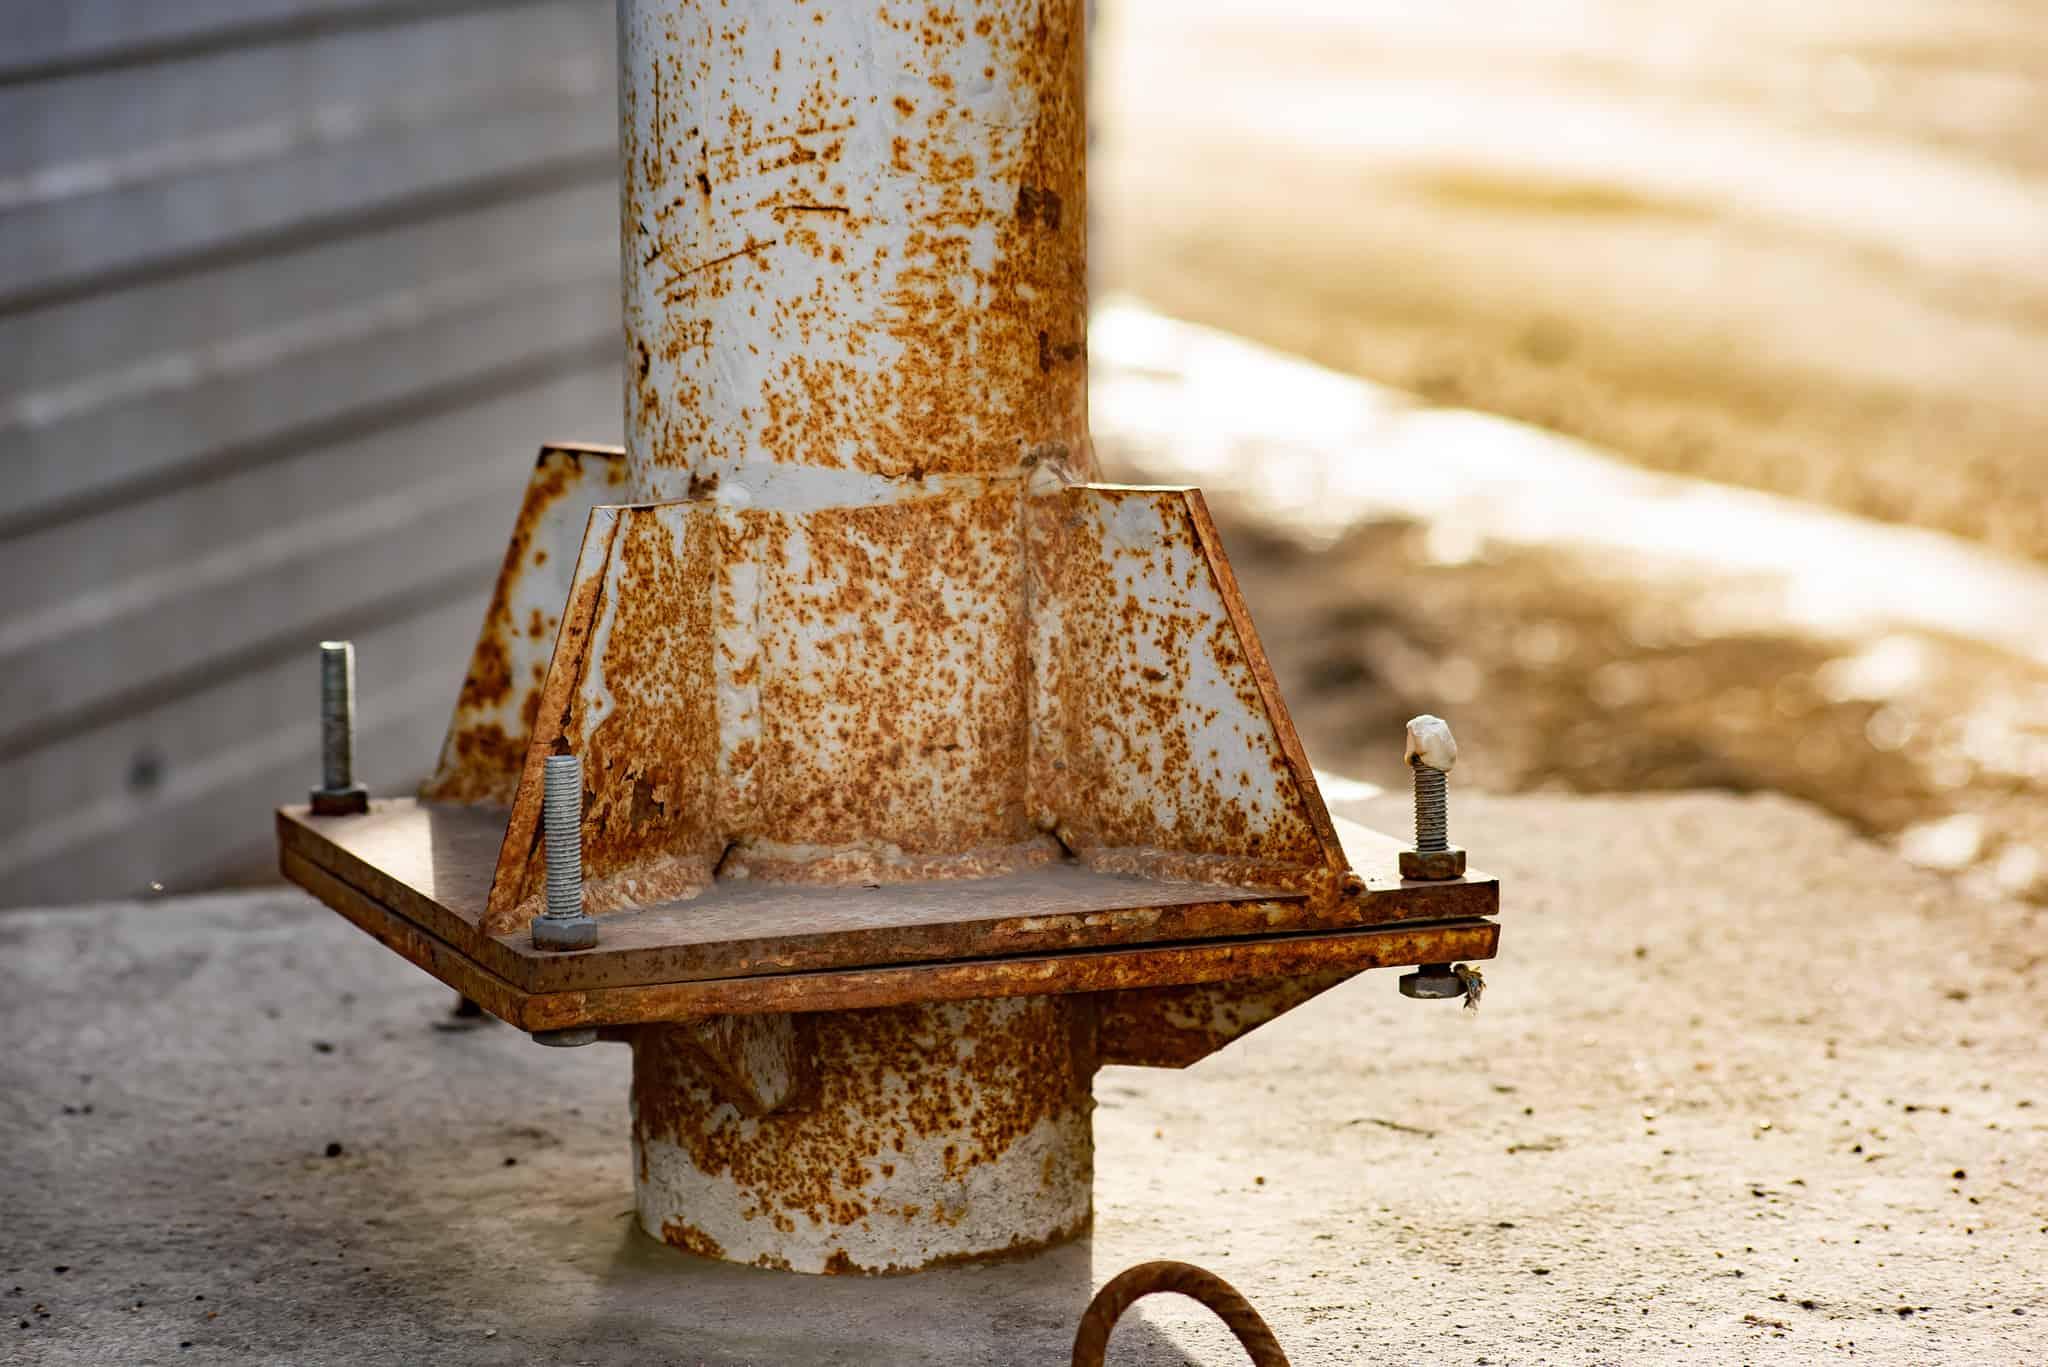 Orsaker till korrosion